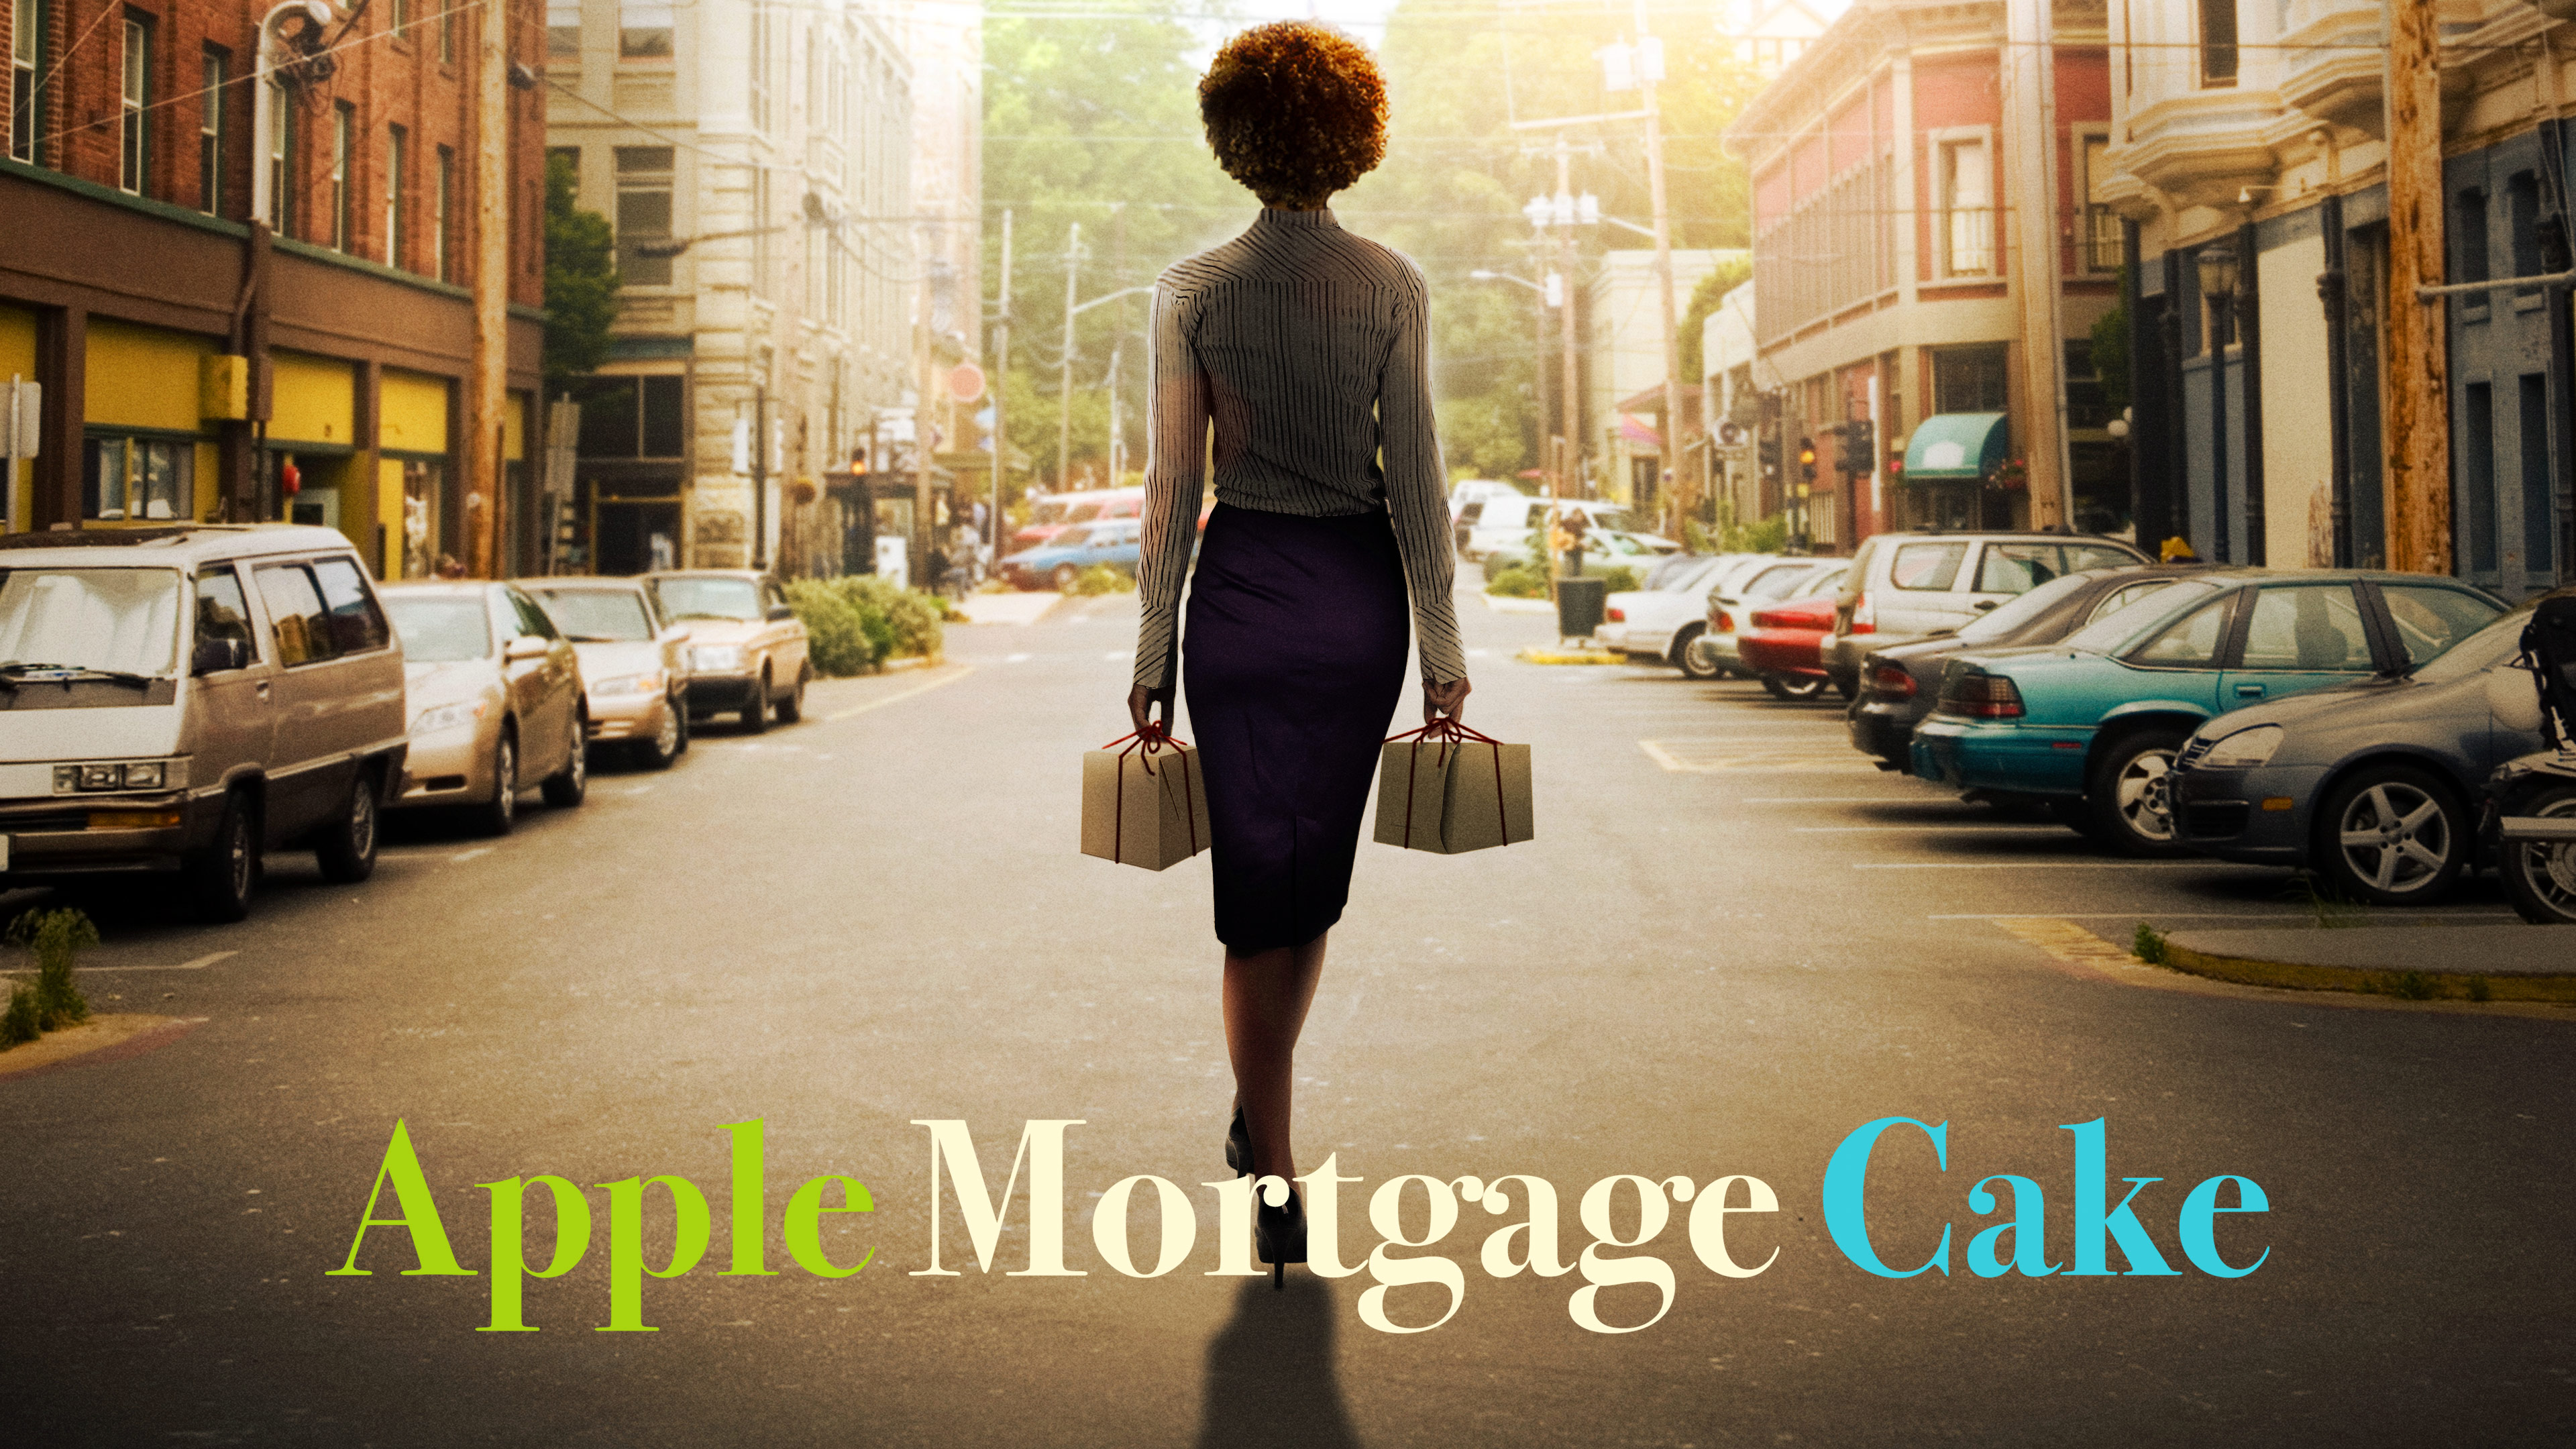 Apple Mortgage Cake Trailer